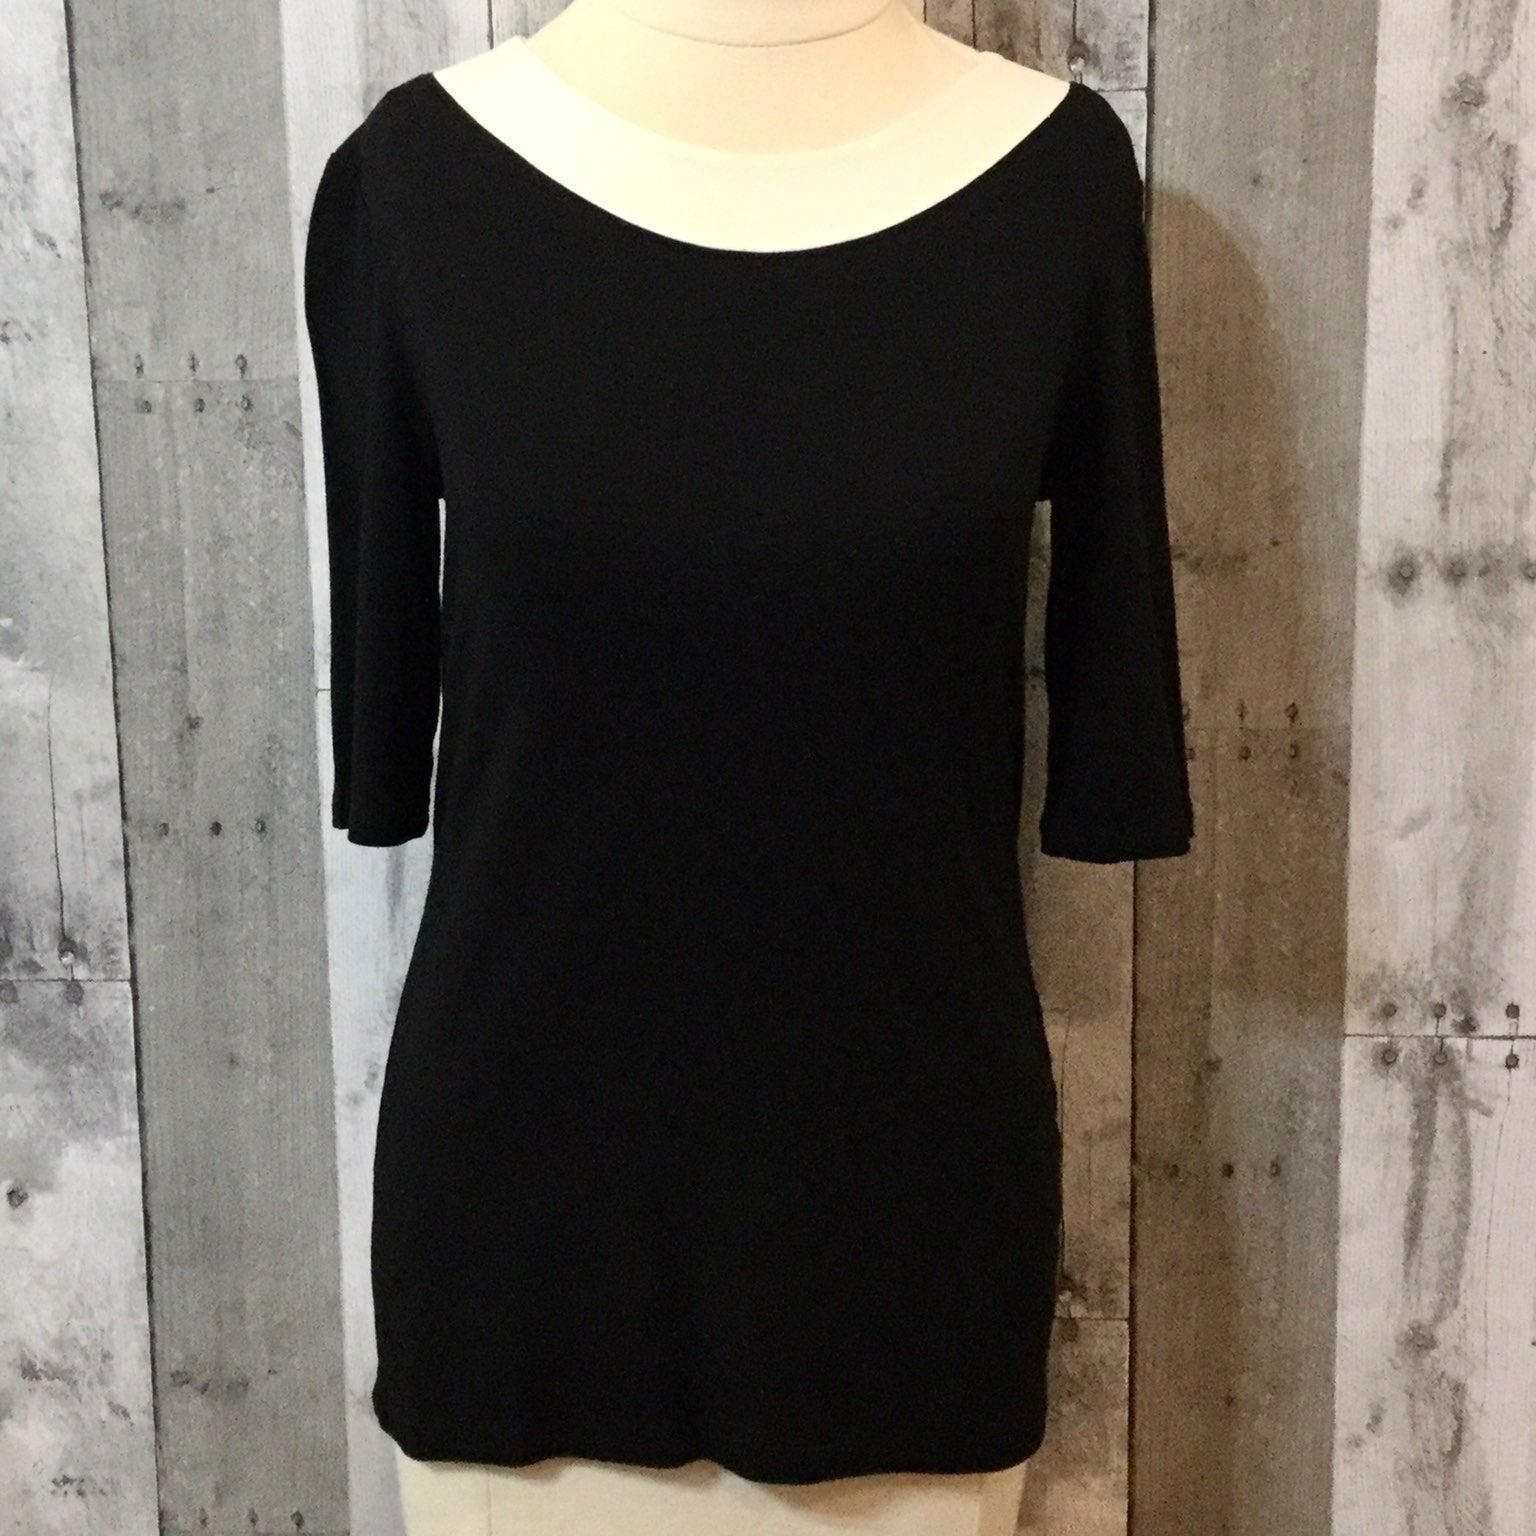 PENDLETON Soft Knit Top Black Ivory NWT